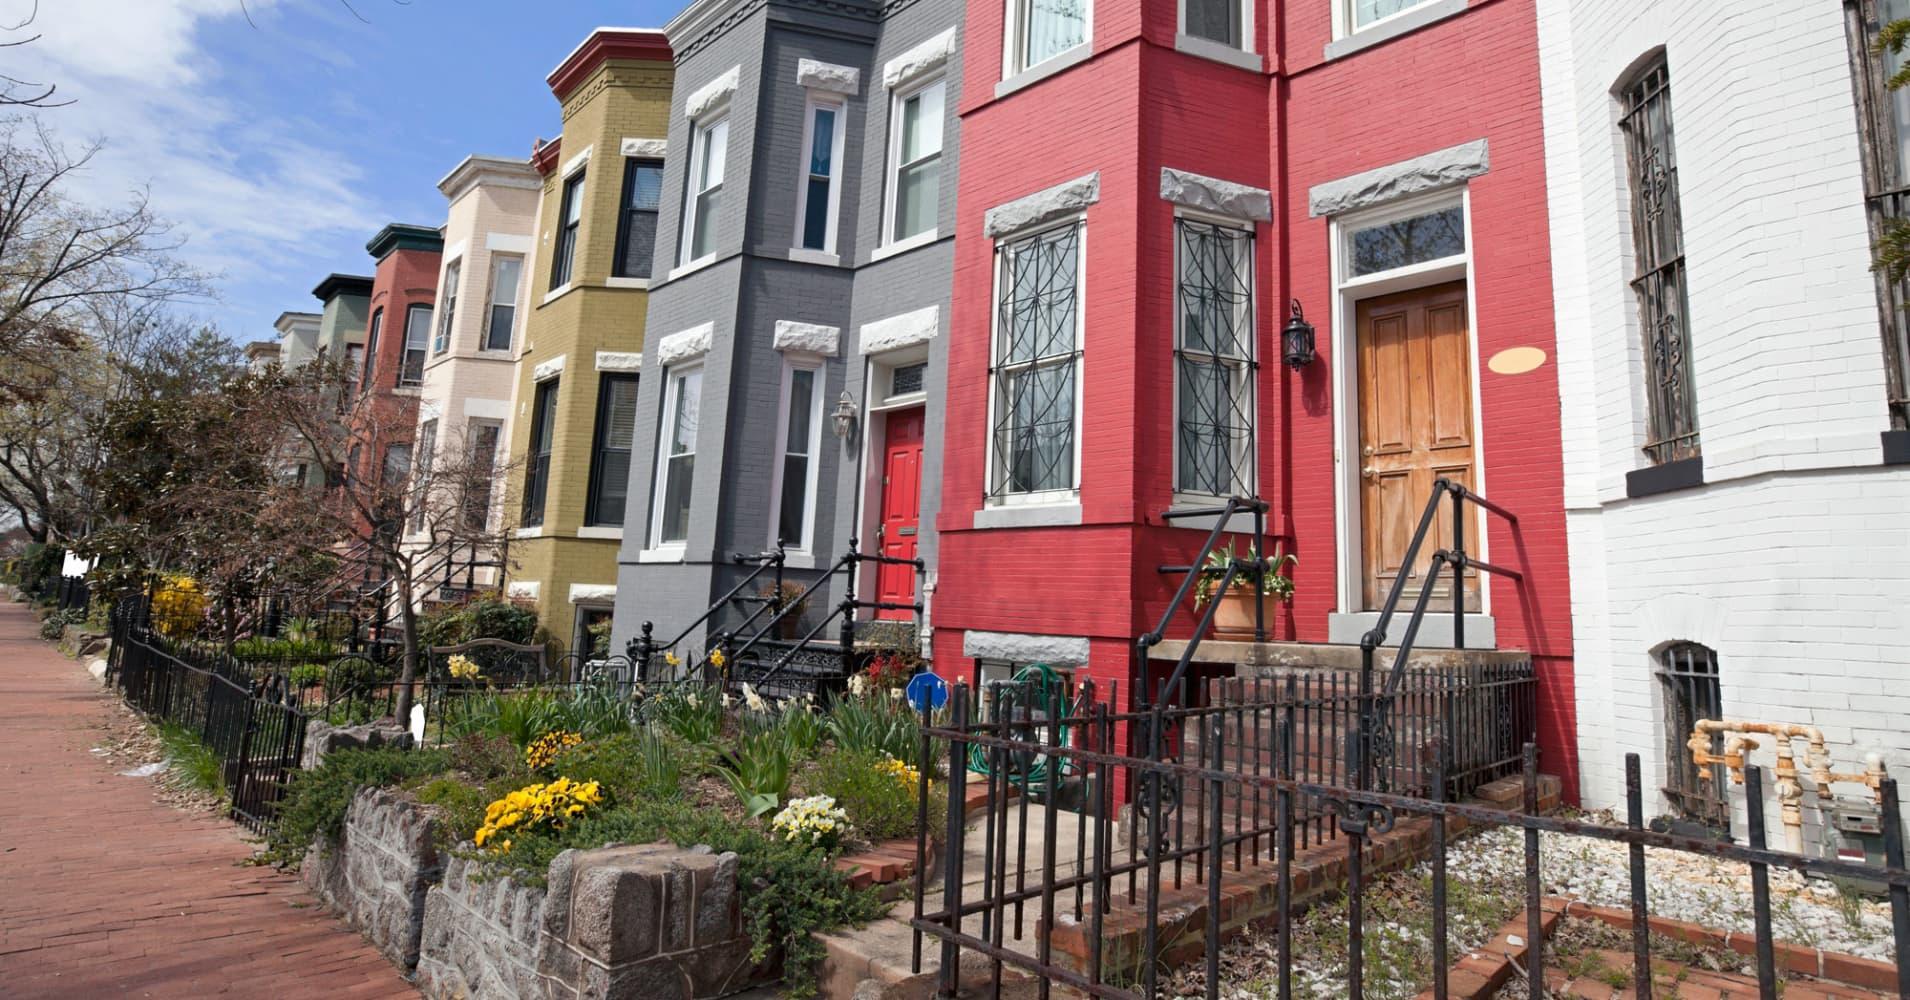 5 innovative ways to save on housing